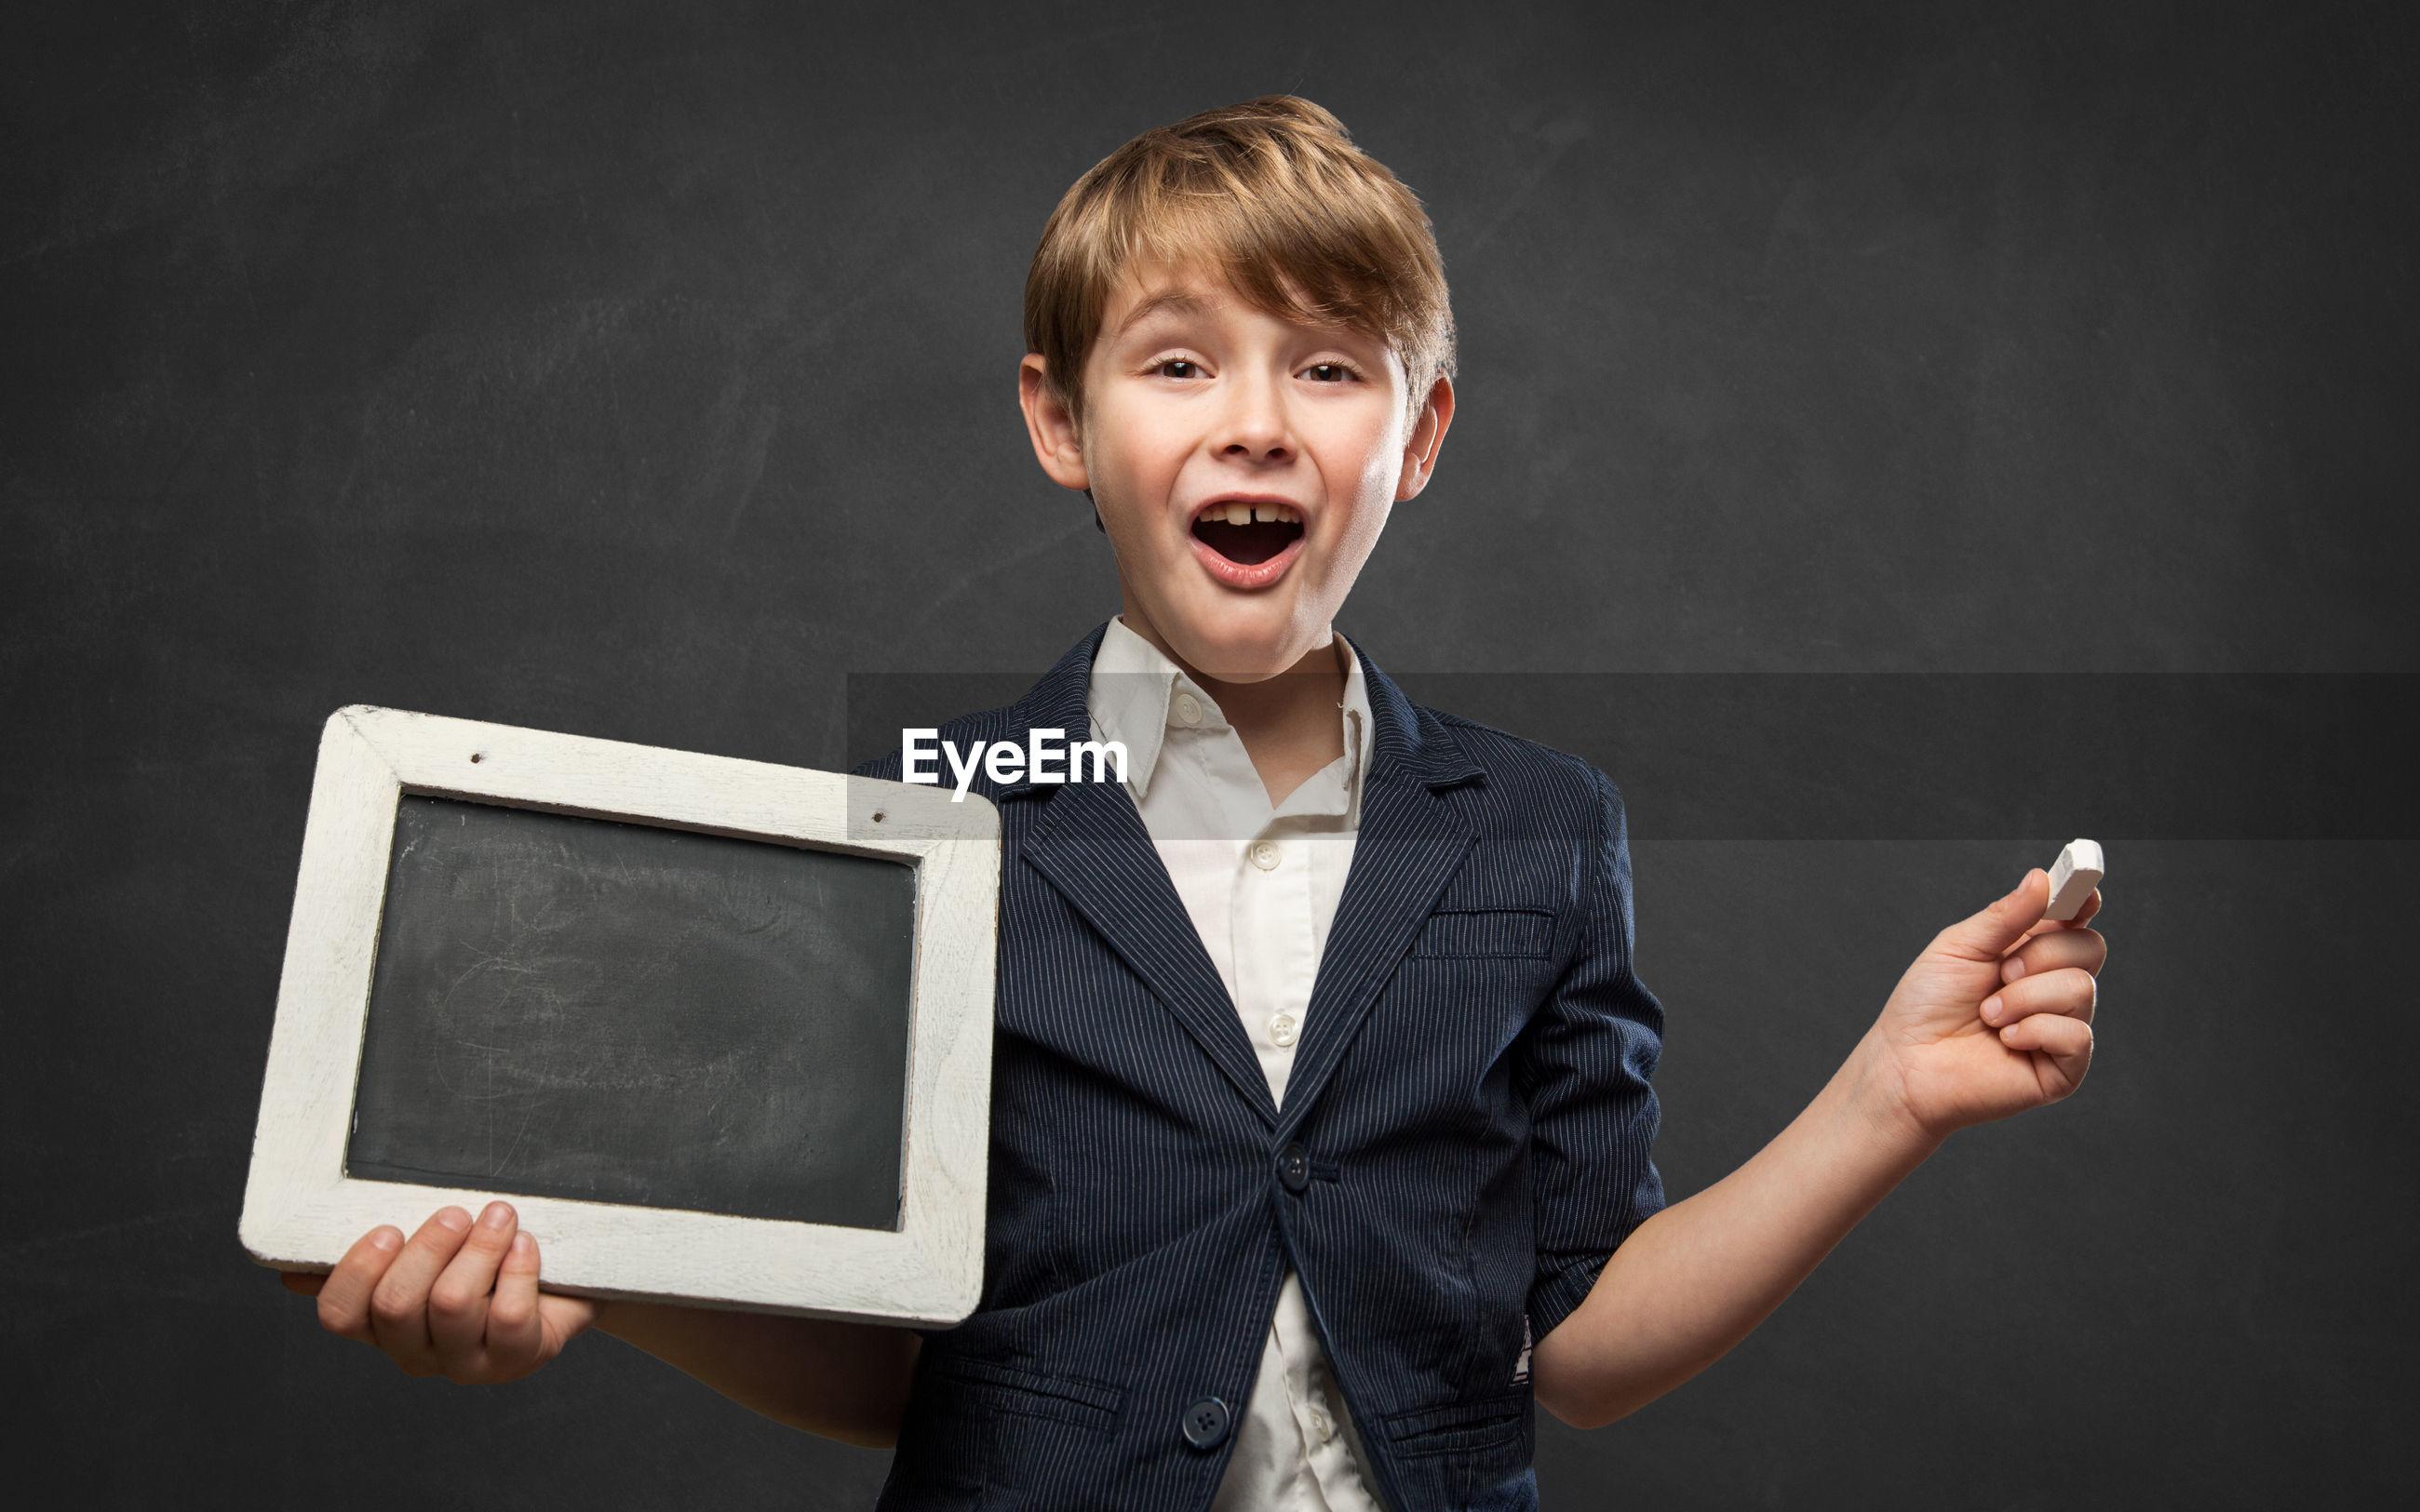 Portrait of boy holding slate standing against black background